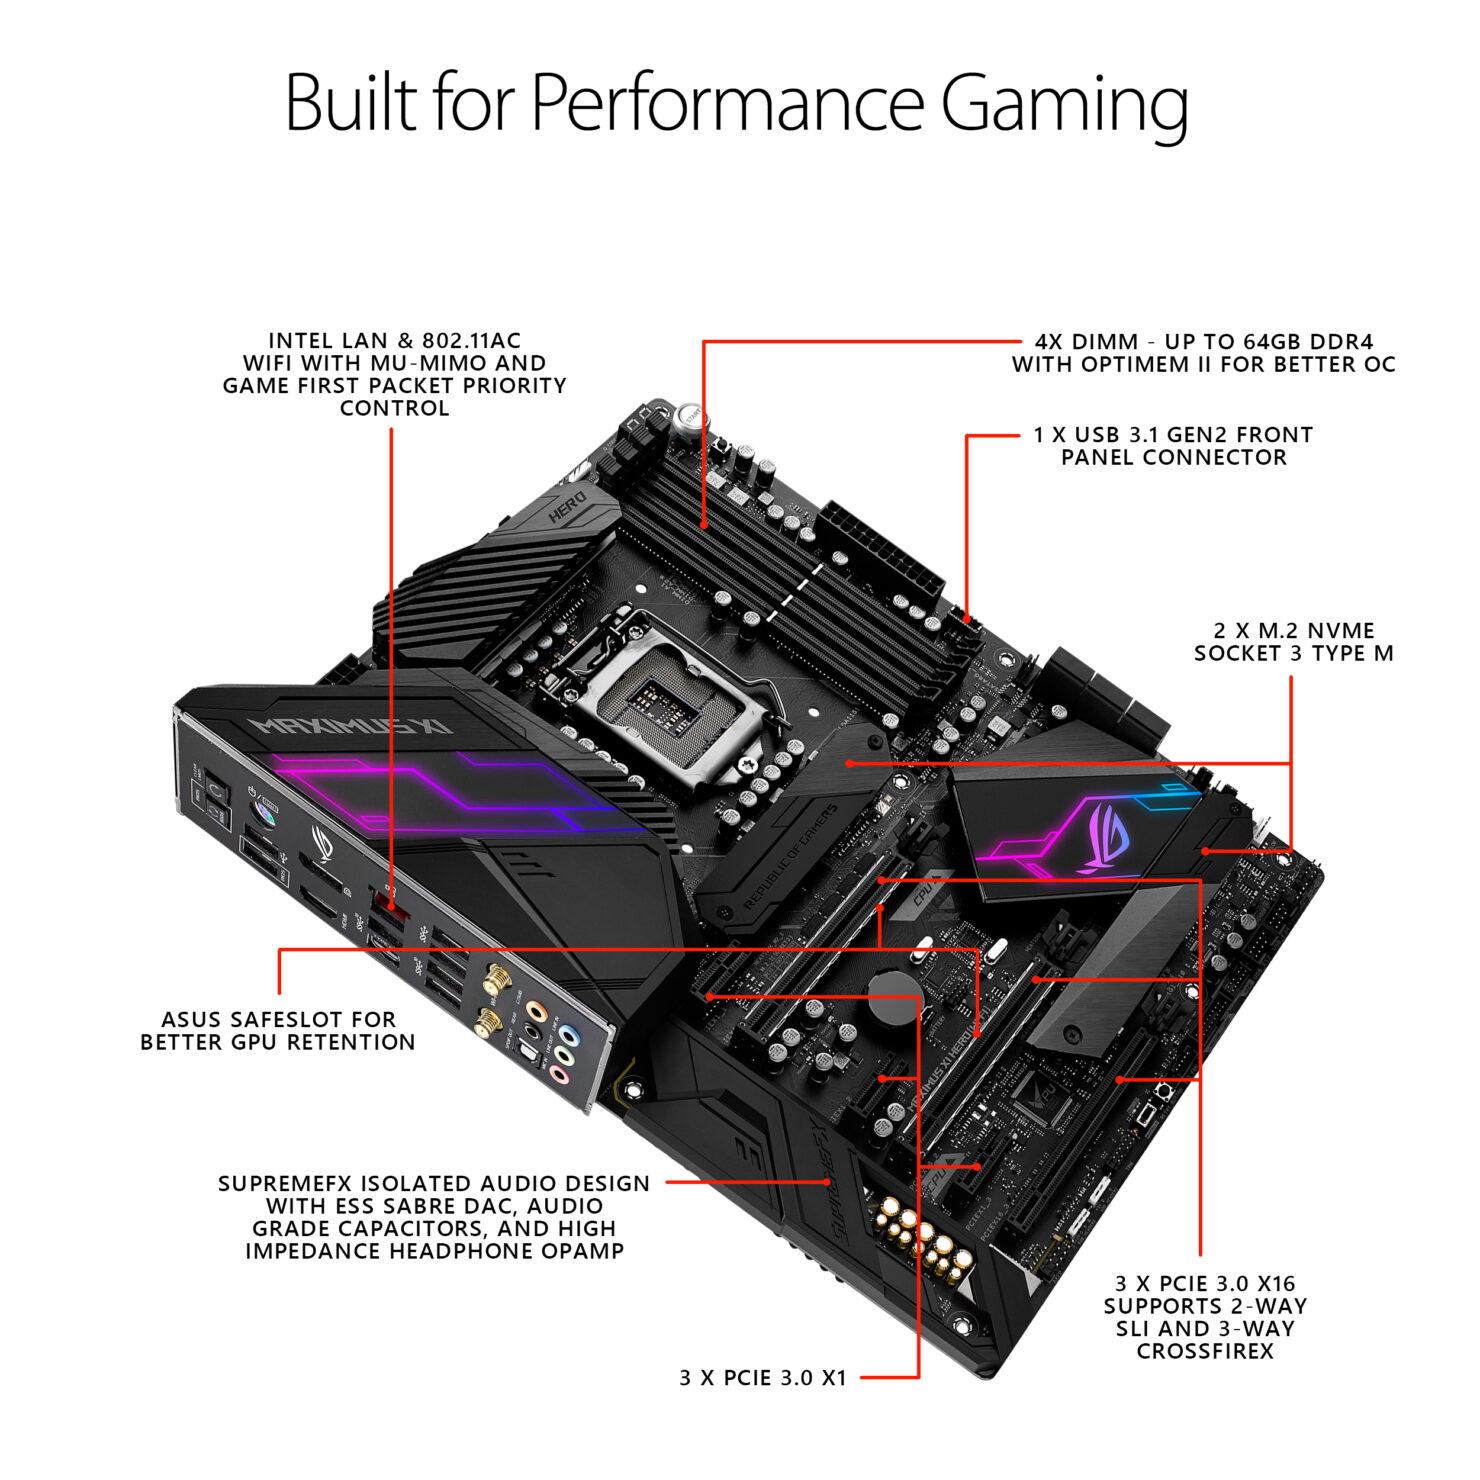 4-rog-maximus-xi-hero-wi-fi-built-for-performance-gaming